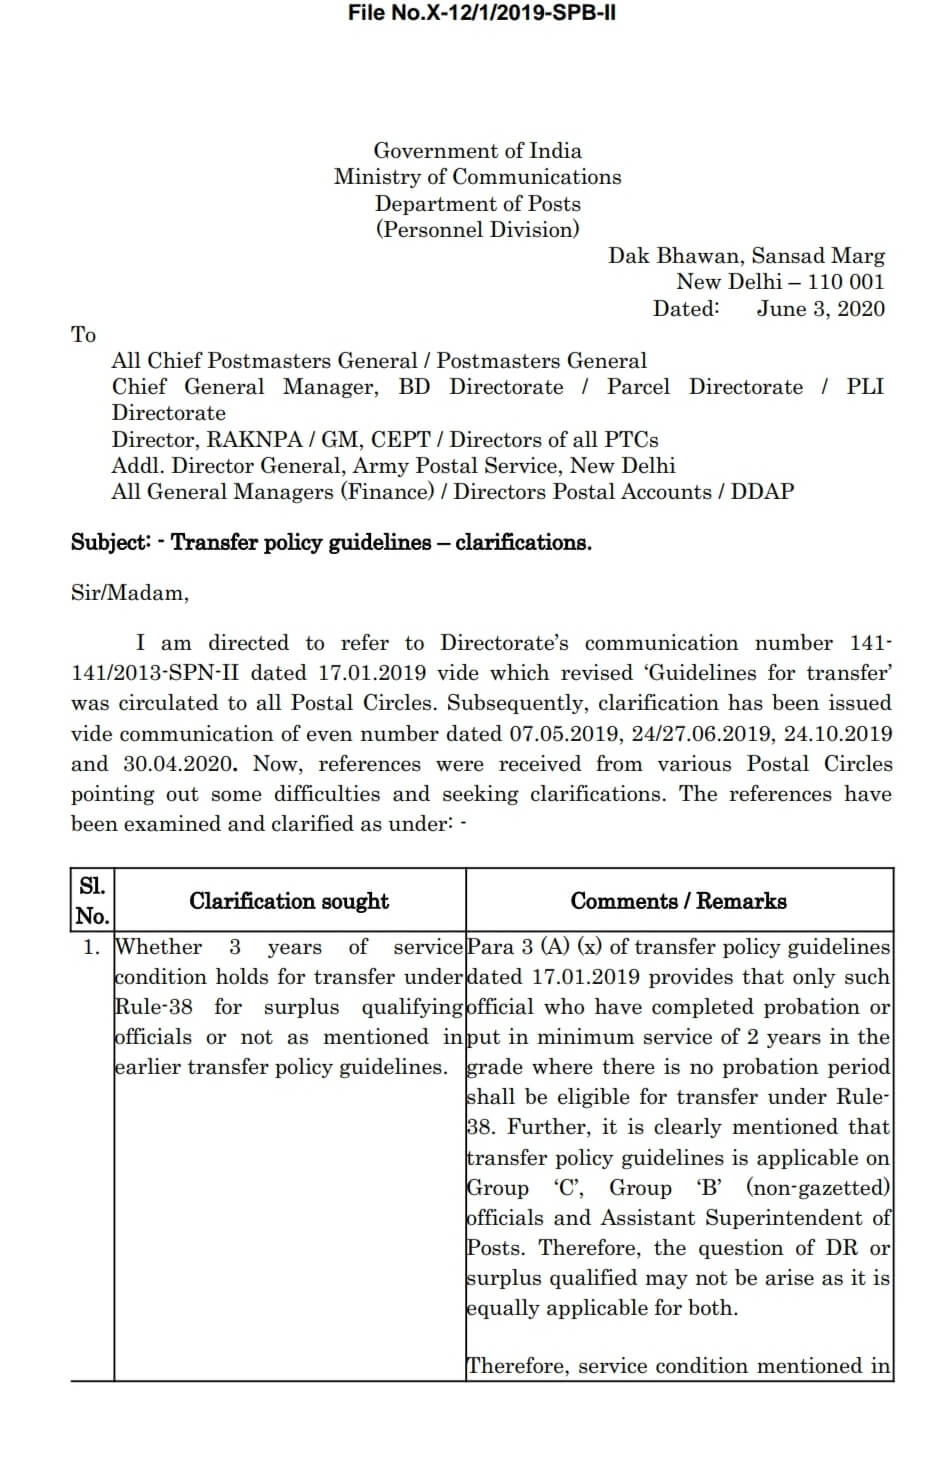 India Post Transfer Policy Clarification